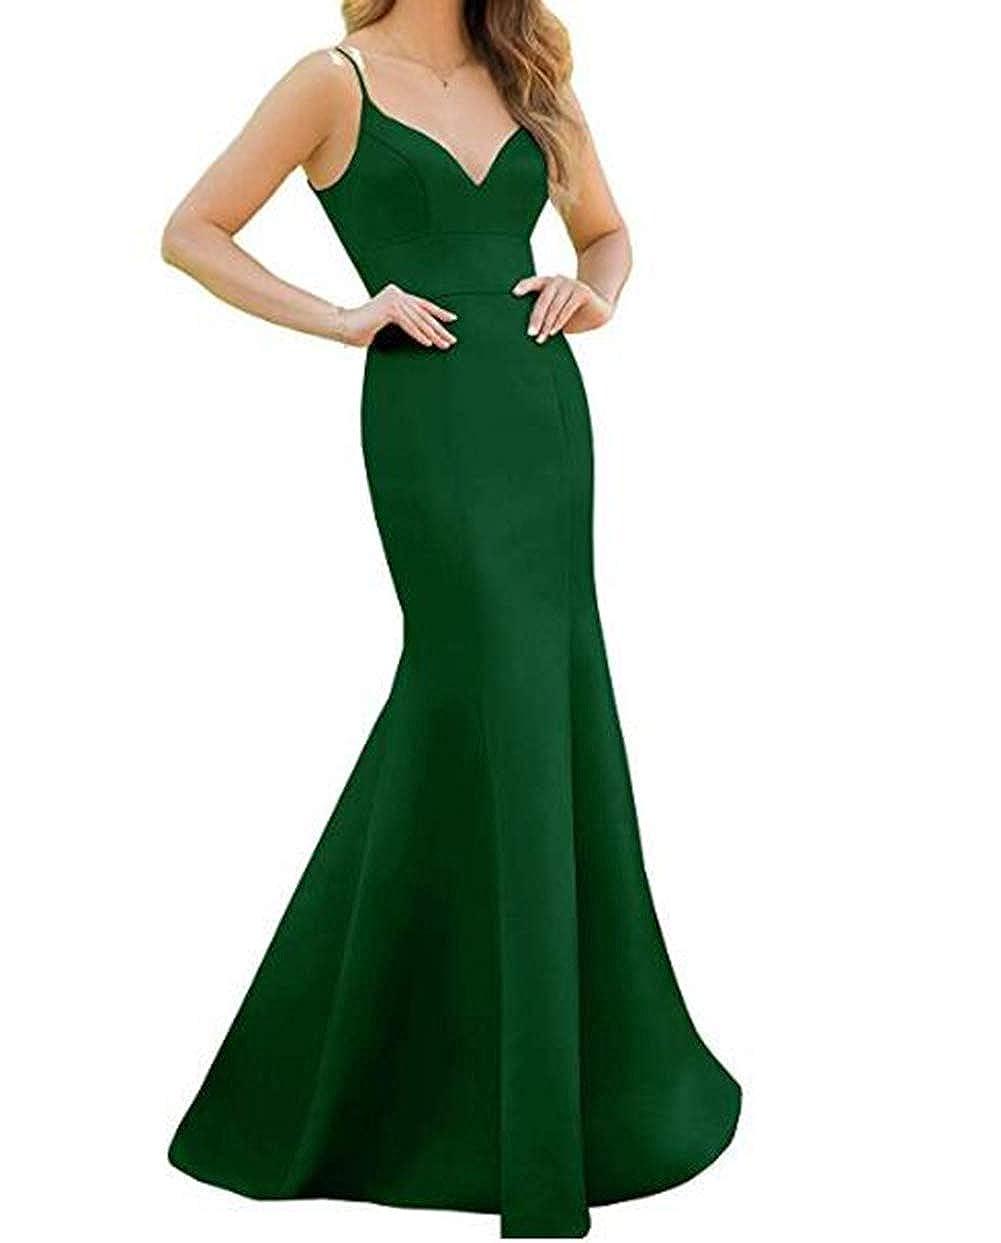 Emerald Tsbridal Women's Spaghetti Straps Satin Bridesmaid Dress Long Mermaid V Neck Formal Prom Evening Party Dresses